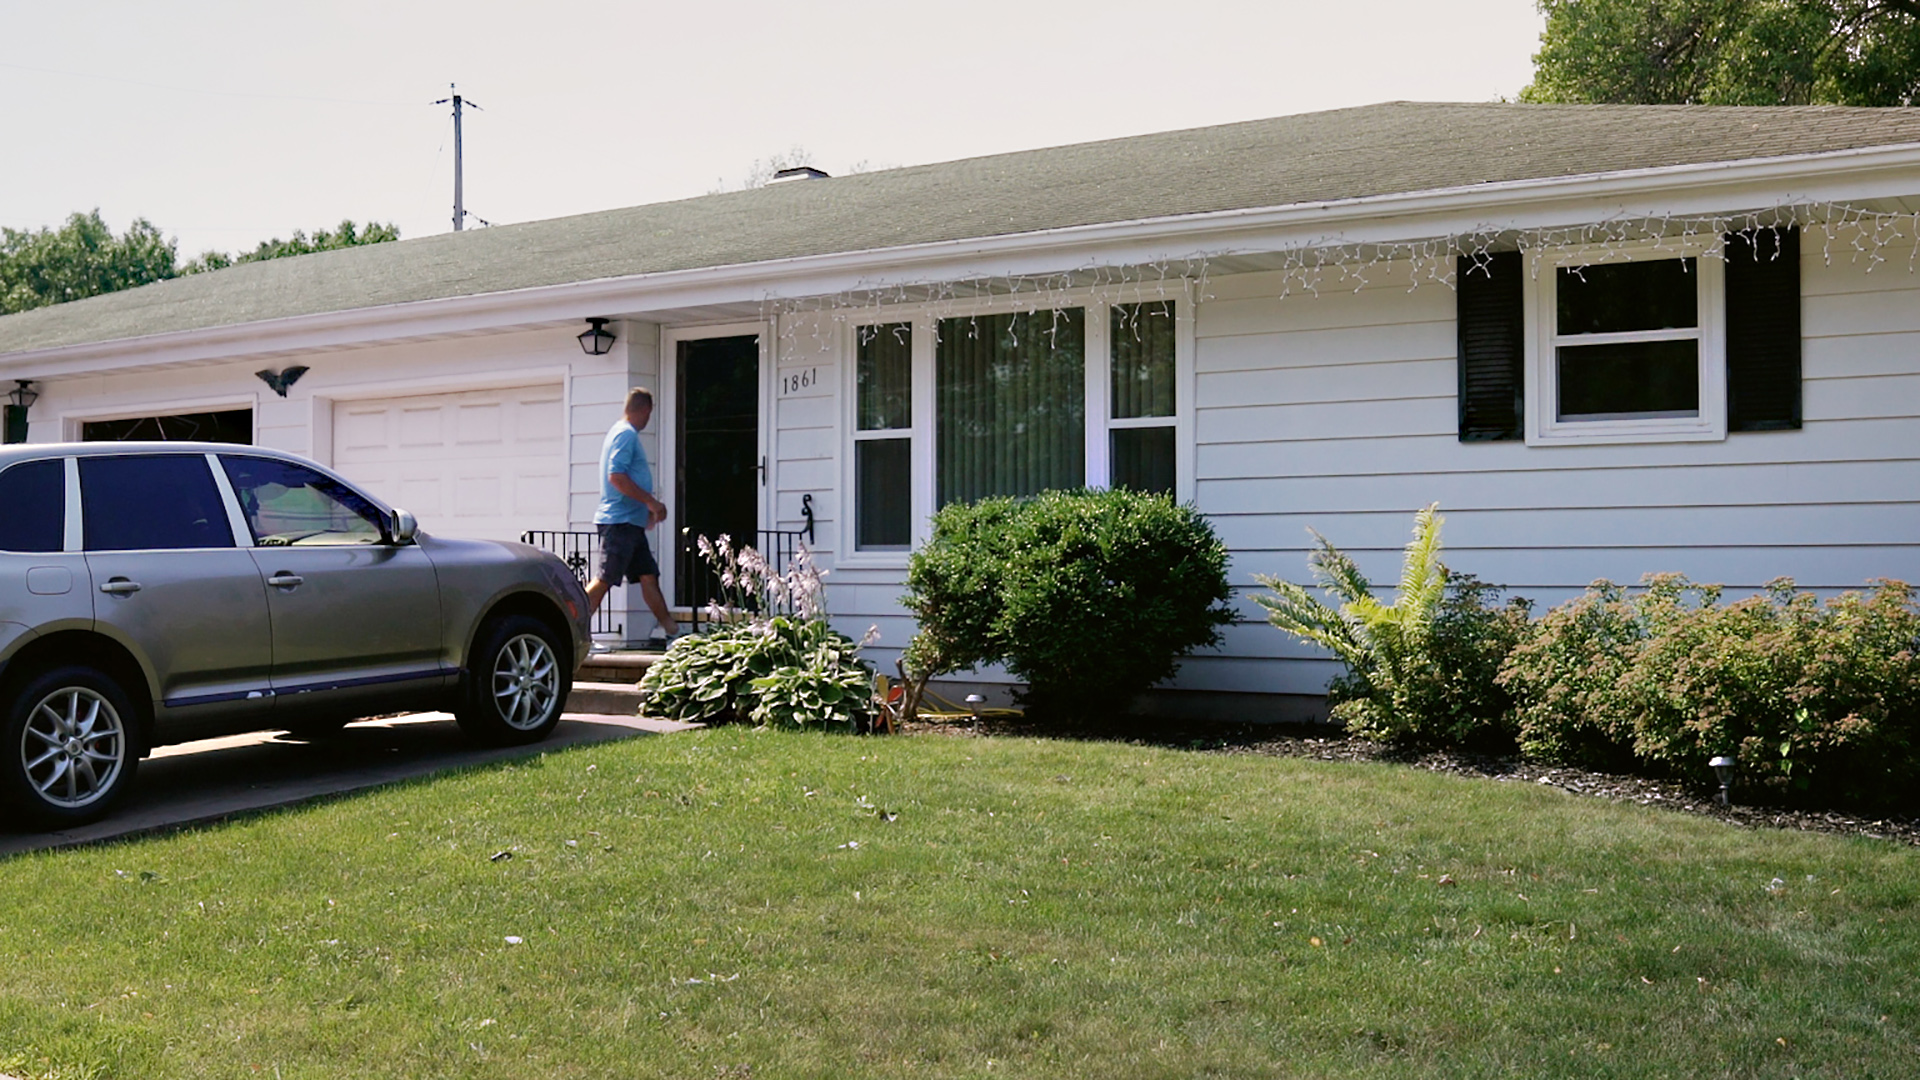 Joe DeKeyser walks into entrance of rental house